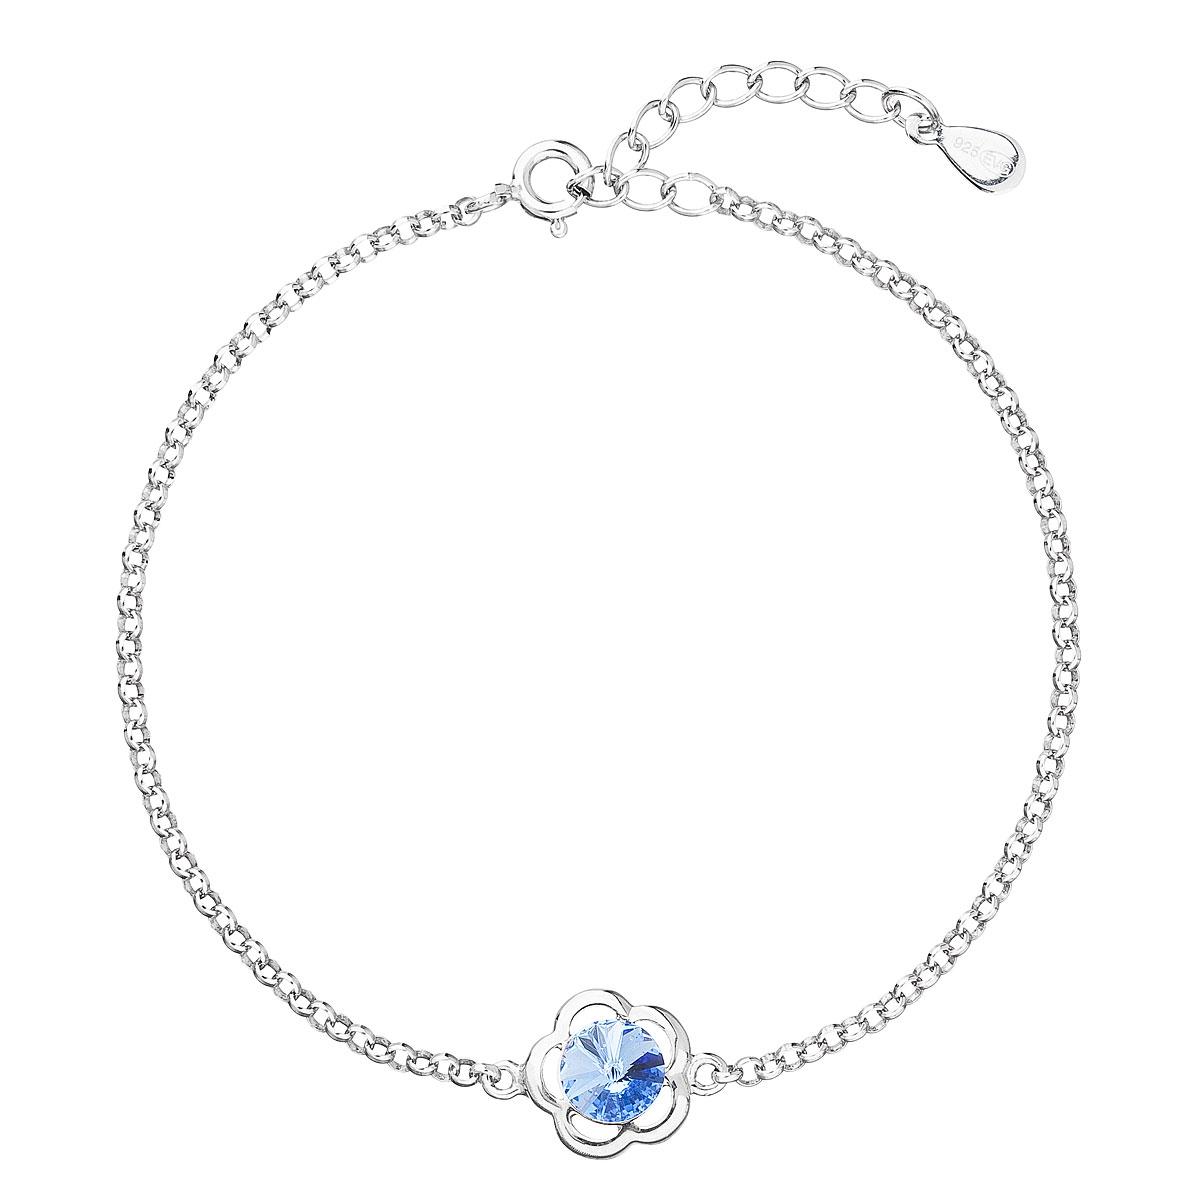 Stříbrný náramek s tyrkysovým kamenem Crystals from Swarovski® Aqua EG7057-AQ